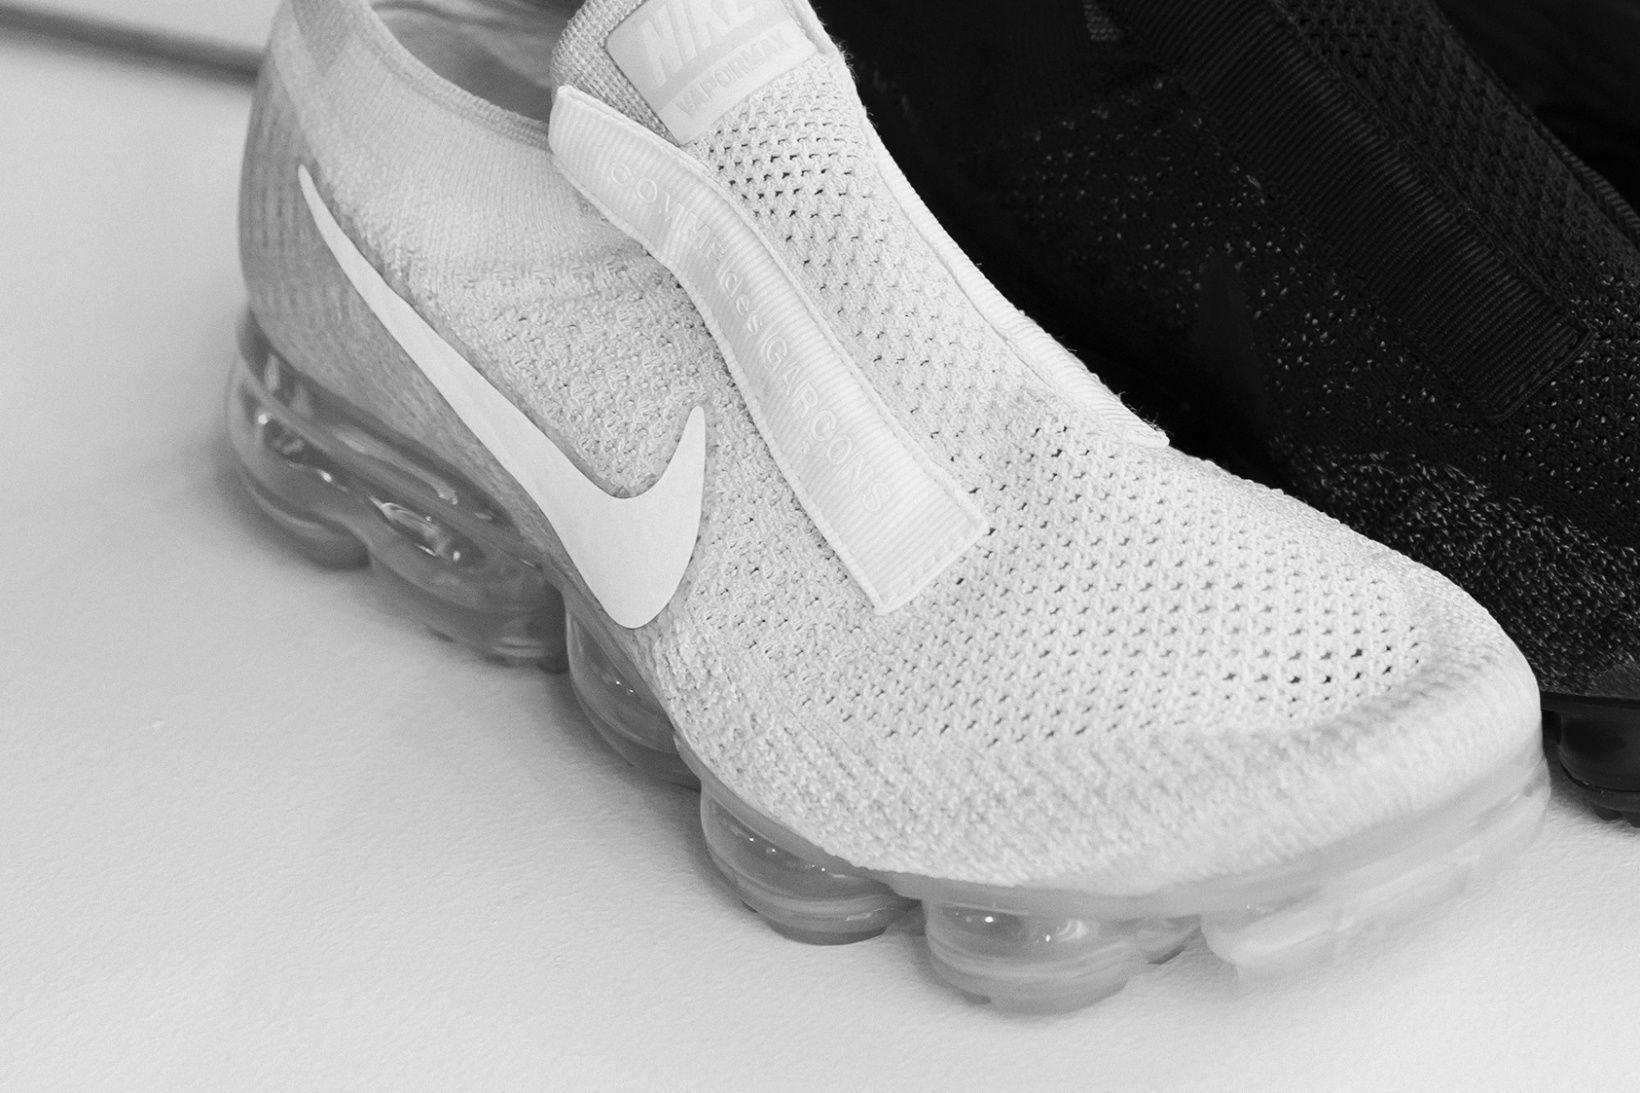 07e8b56d71e COMME des GARÇONS x NikeLab Vapormax